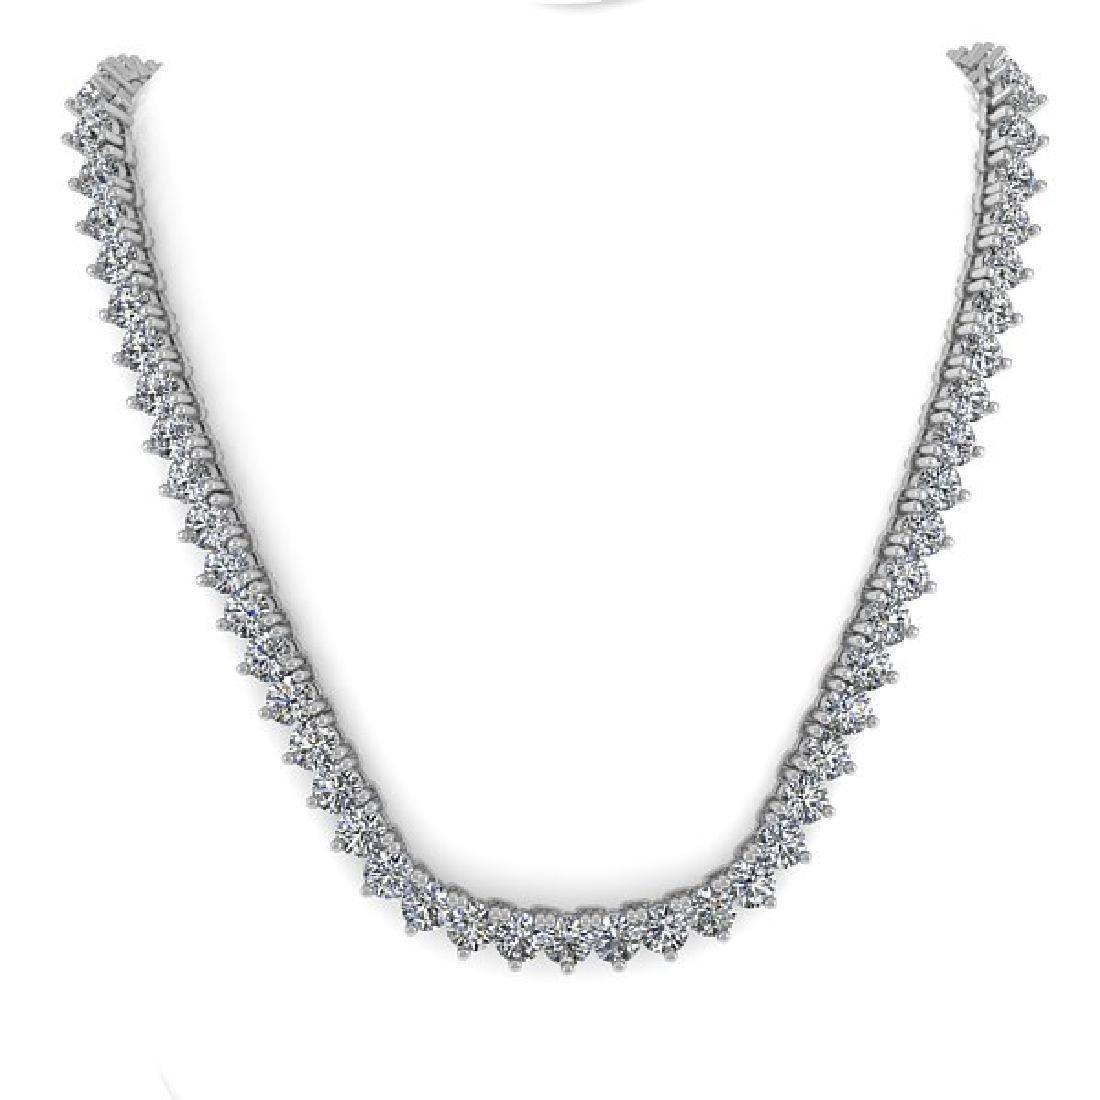 33 CTW Solitaire SI Diamond Necklace 14K White Gold - 3